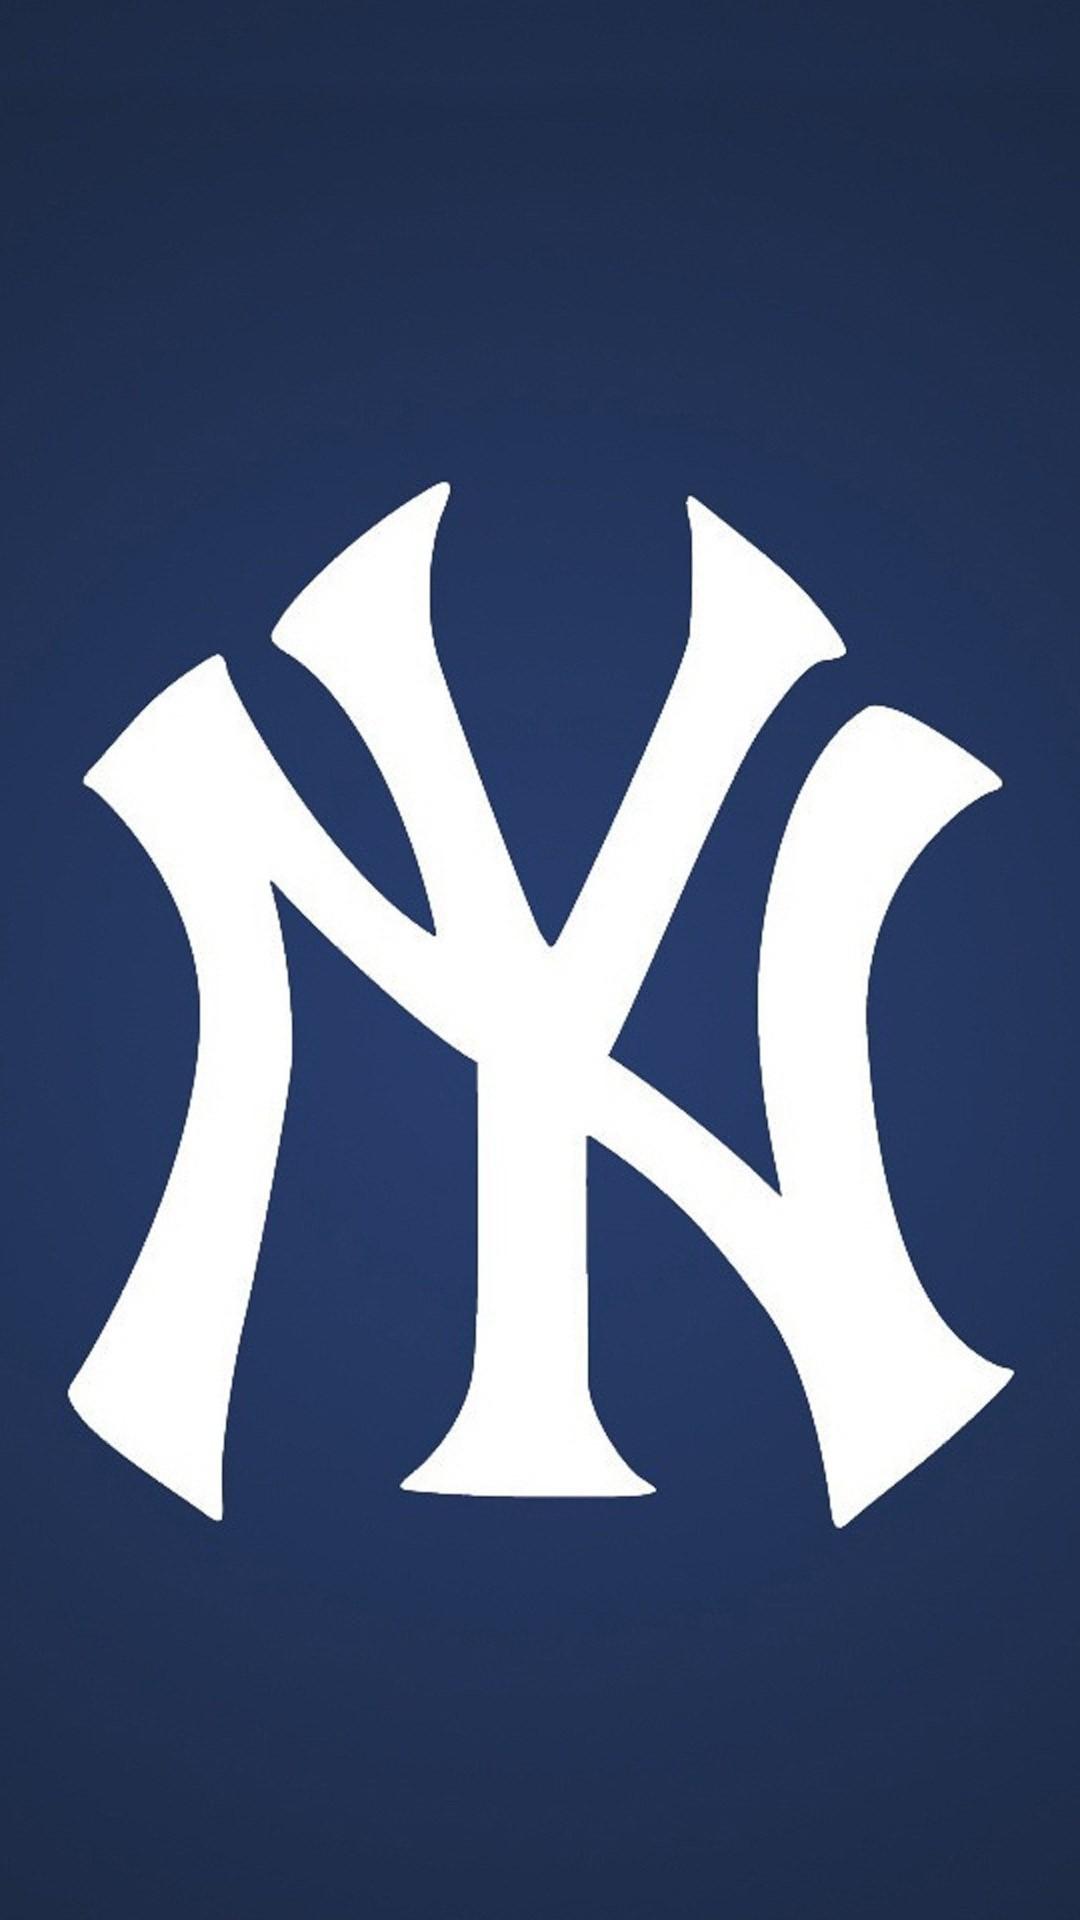 New York Yankees Logo Wallpaper